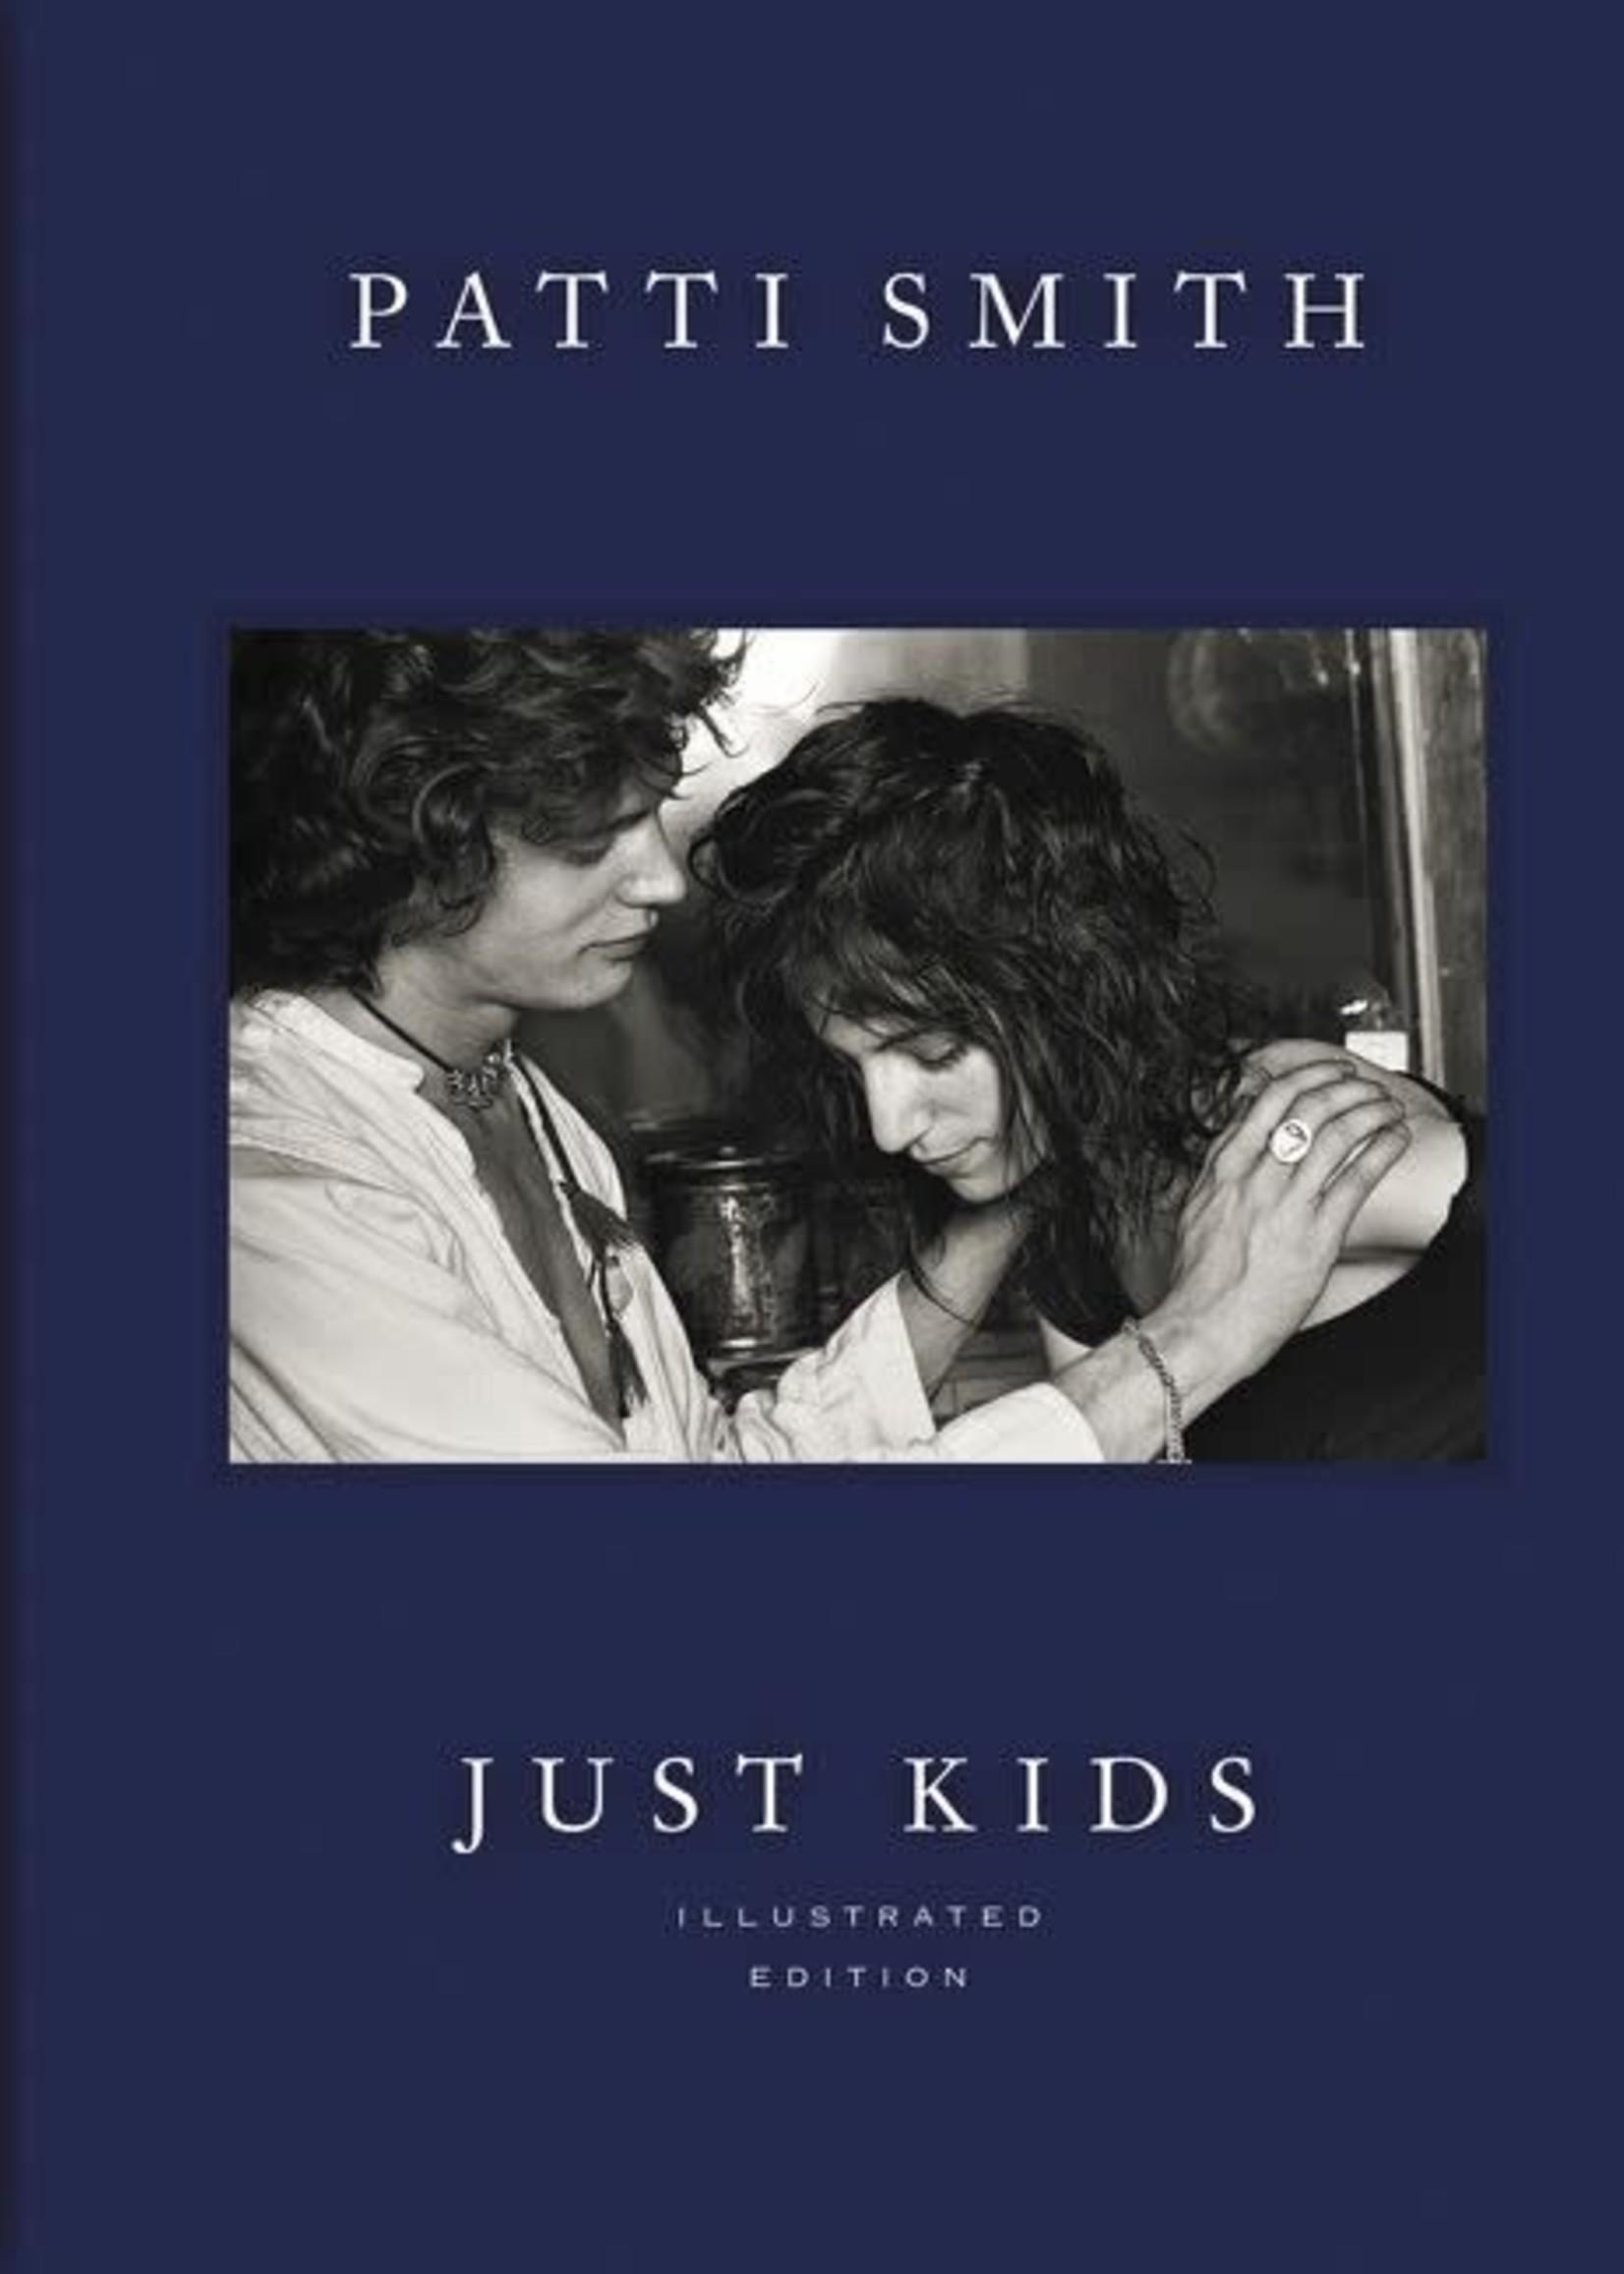 Patti Smith: Just Kids Illustrated Edition